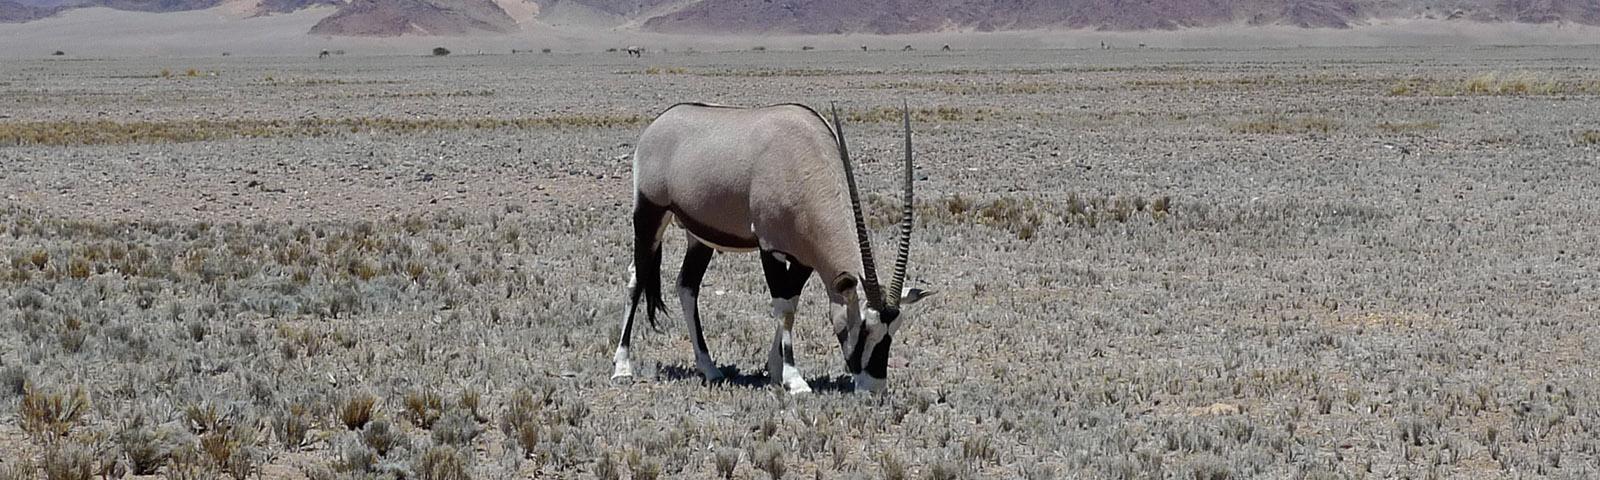 namibia-oryx